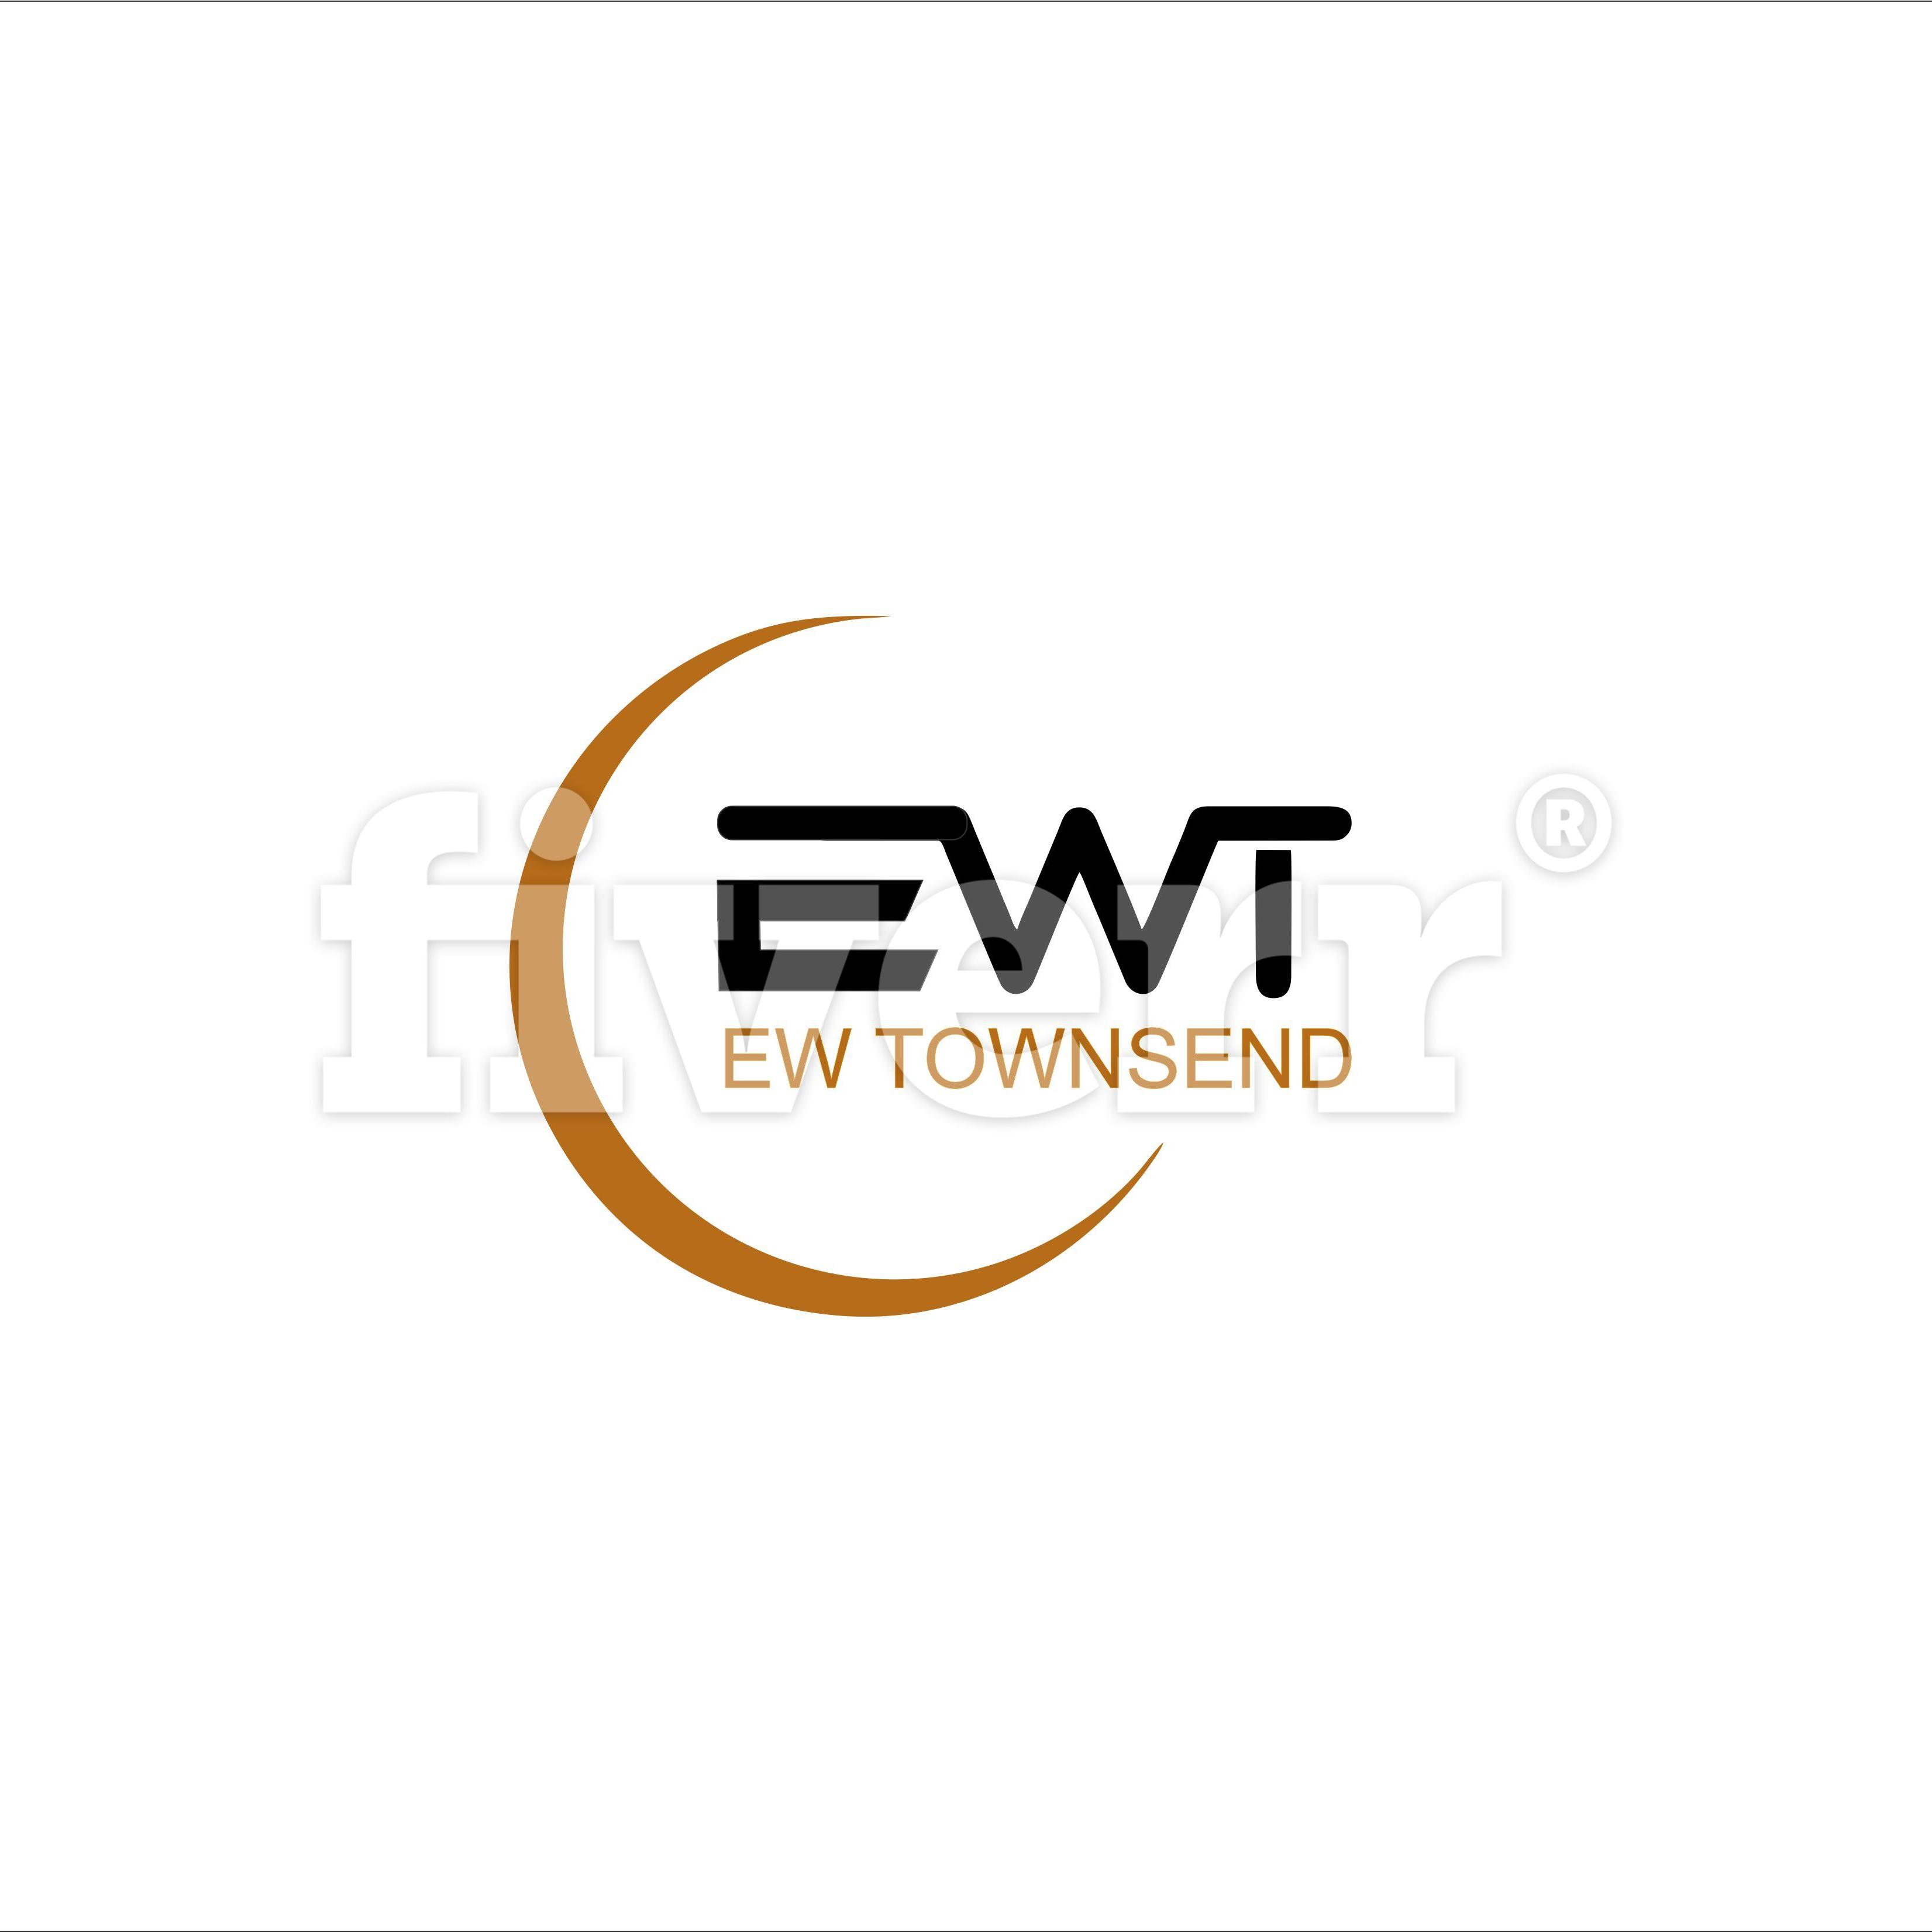 """HFWM"" FINANCIAL EMPOWERMENT STATION"